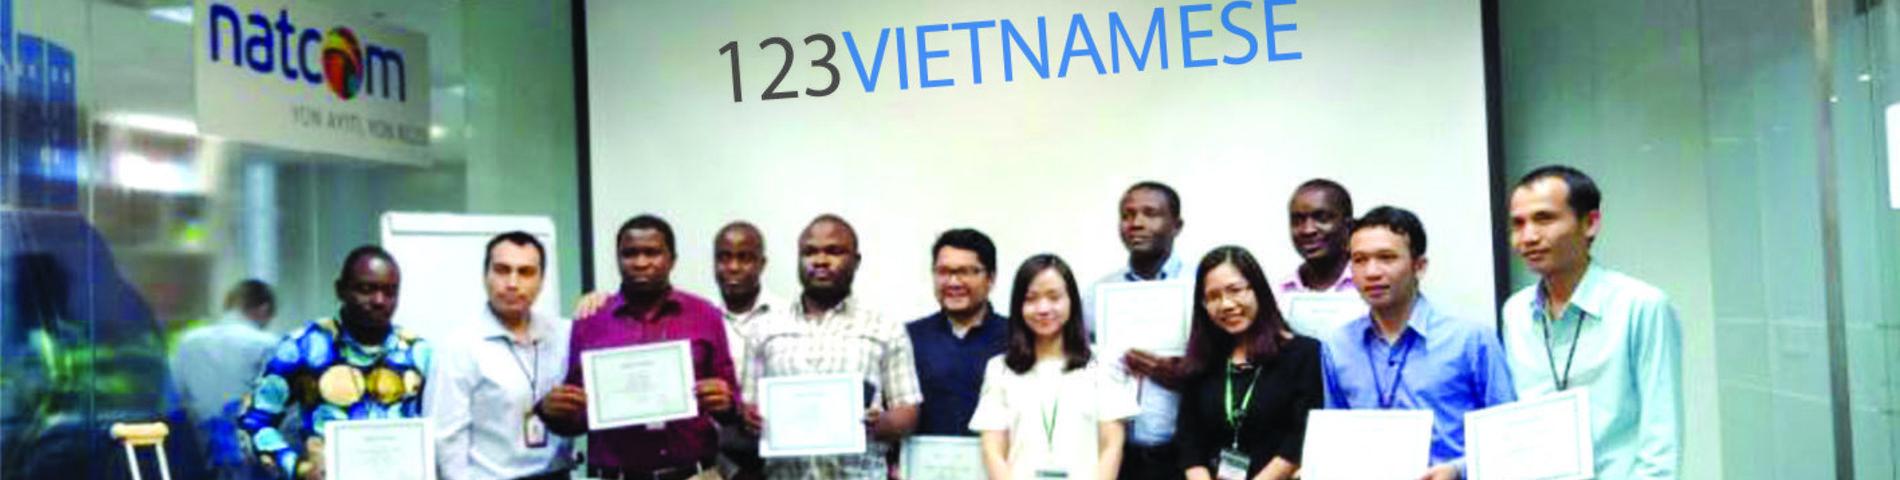 123 Vietnamese Center Bild 1